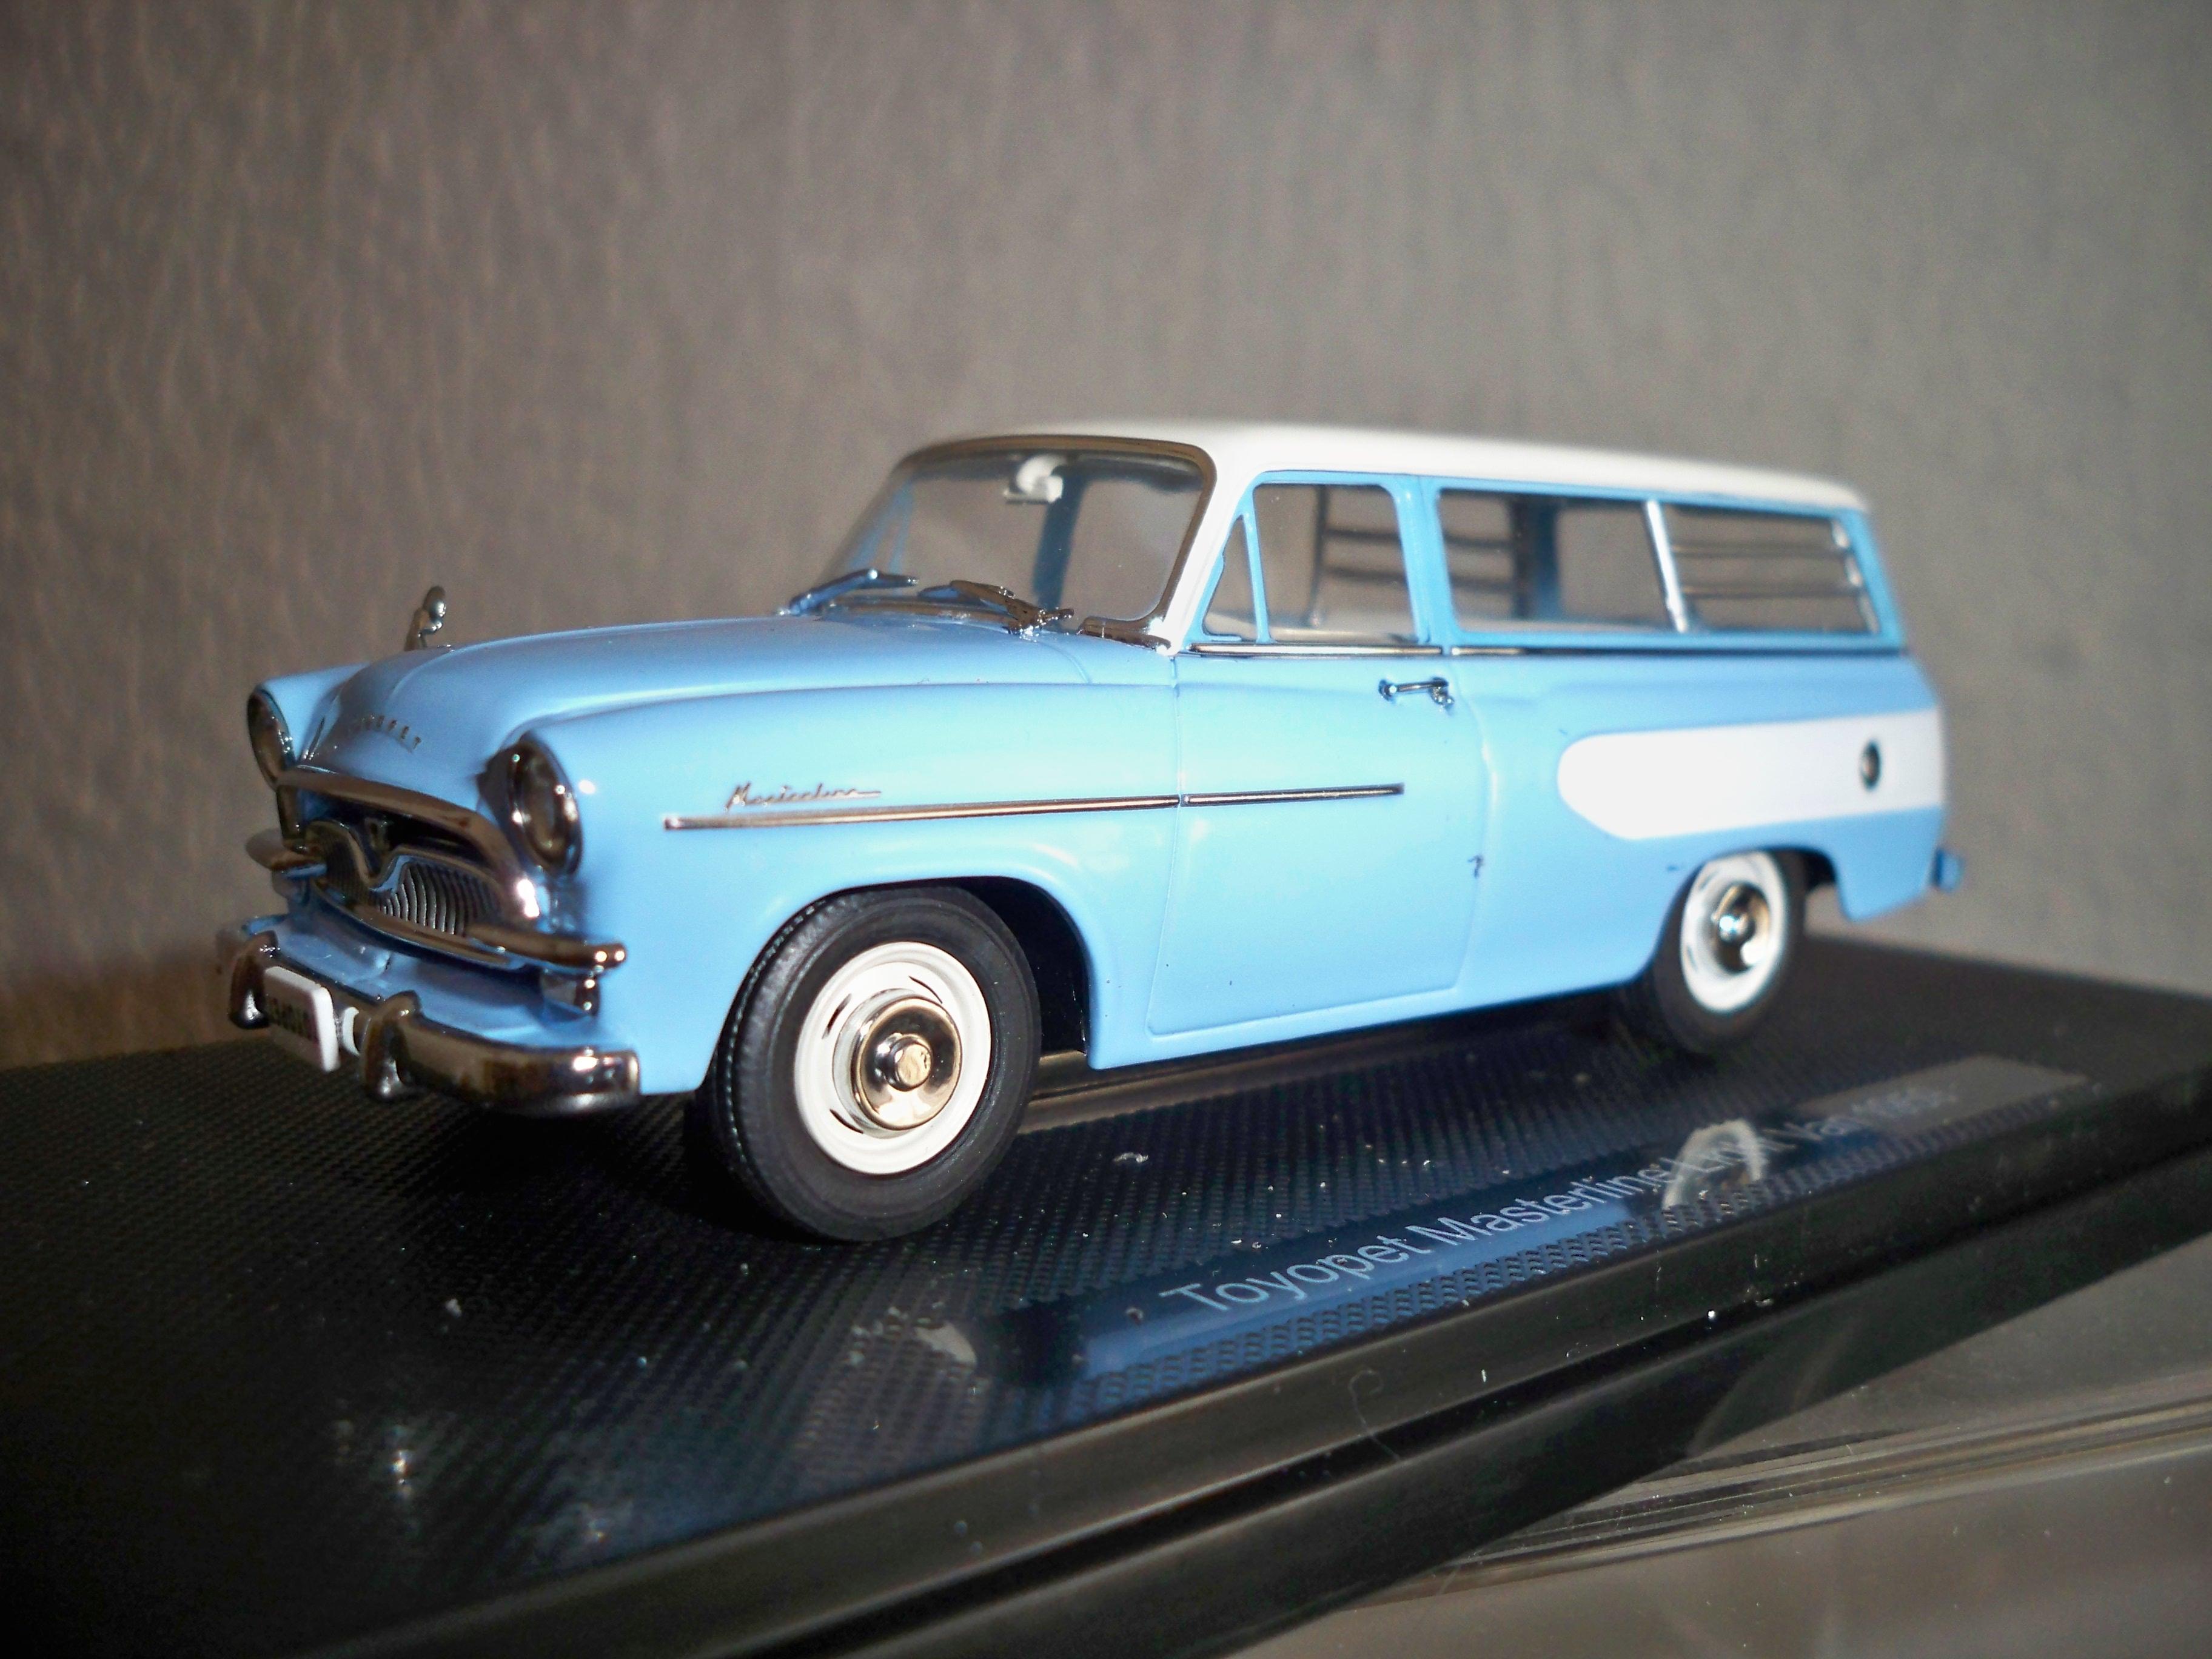 1959 Toyota FA100 Truck For Sale, $74,995 obo, (Fiji) | In My Garage